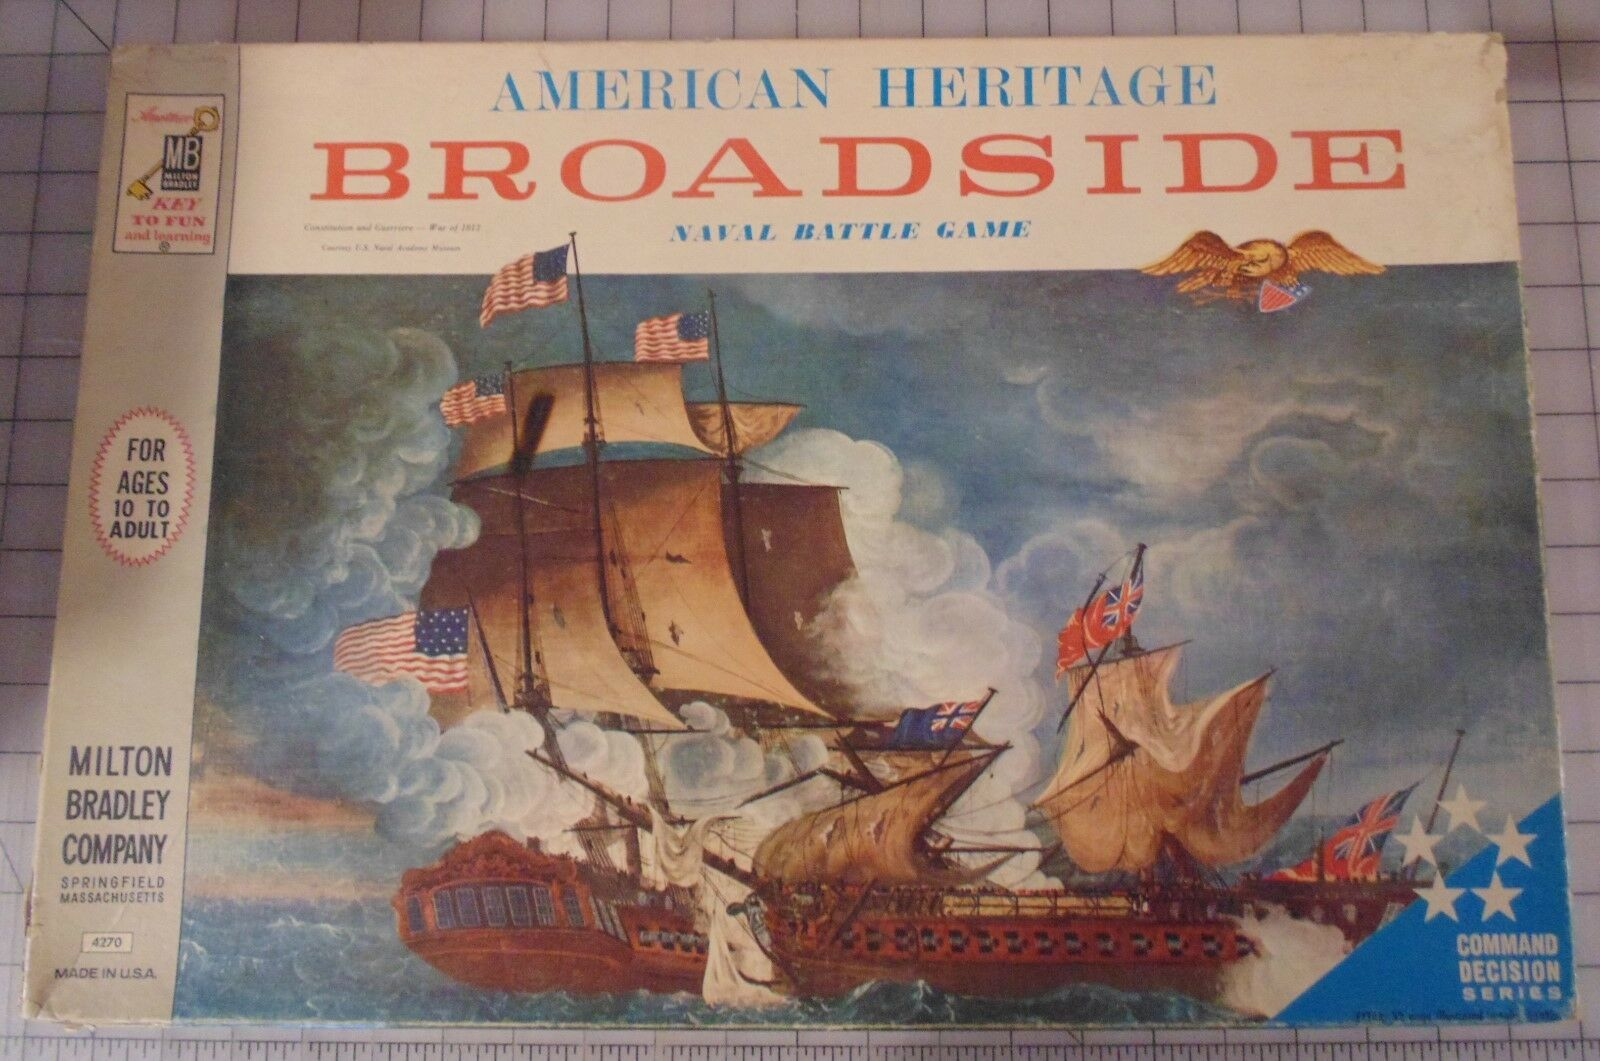 Vintage American Heritage Broadside Naval Battle Board Game 1962 MB